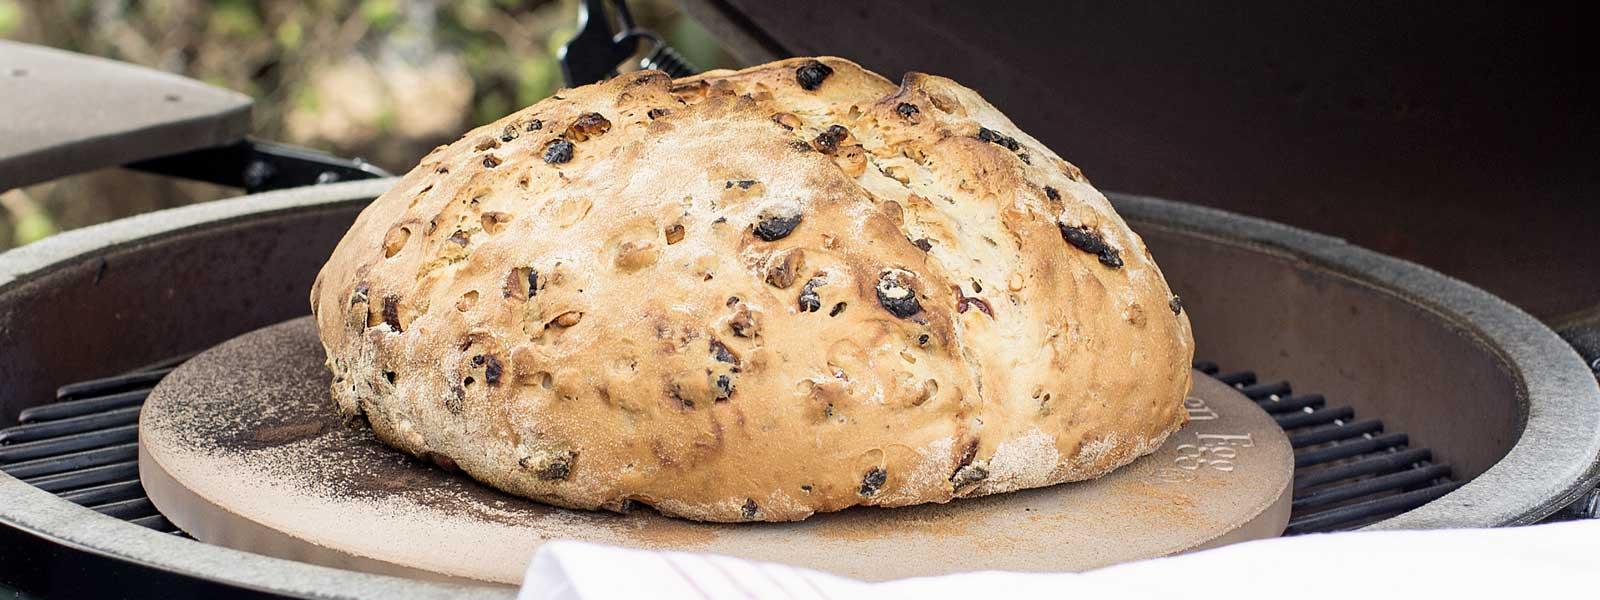 Durum Bread baked on the Big Green Egg